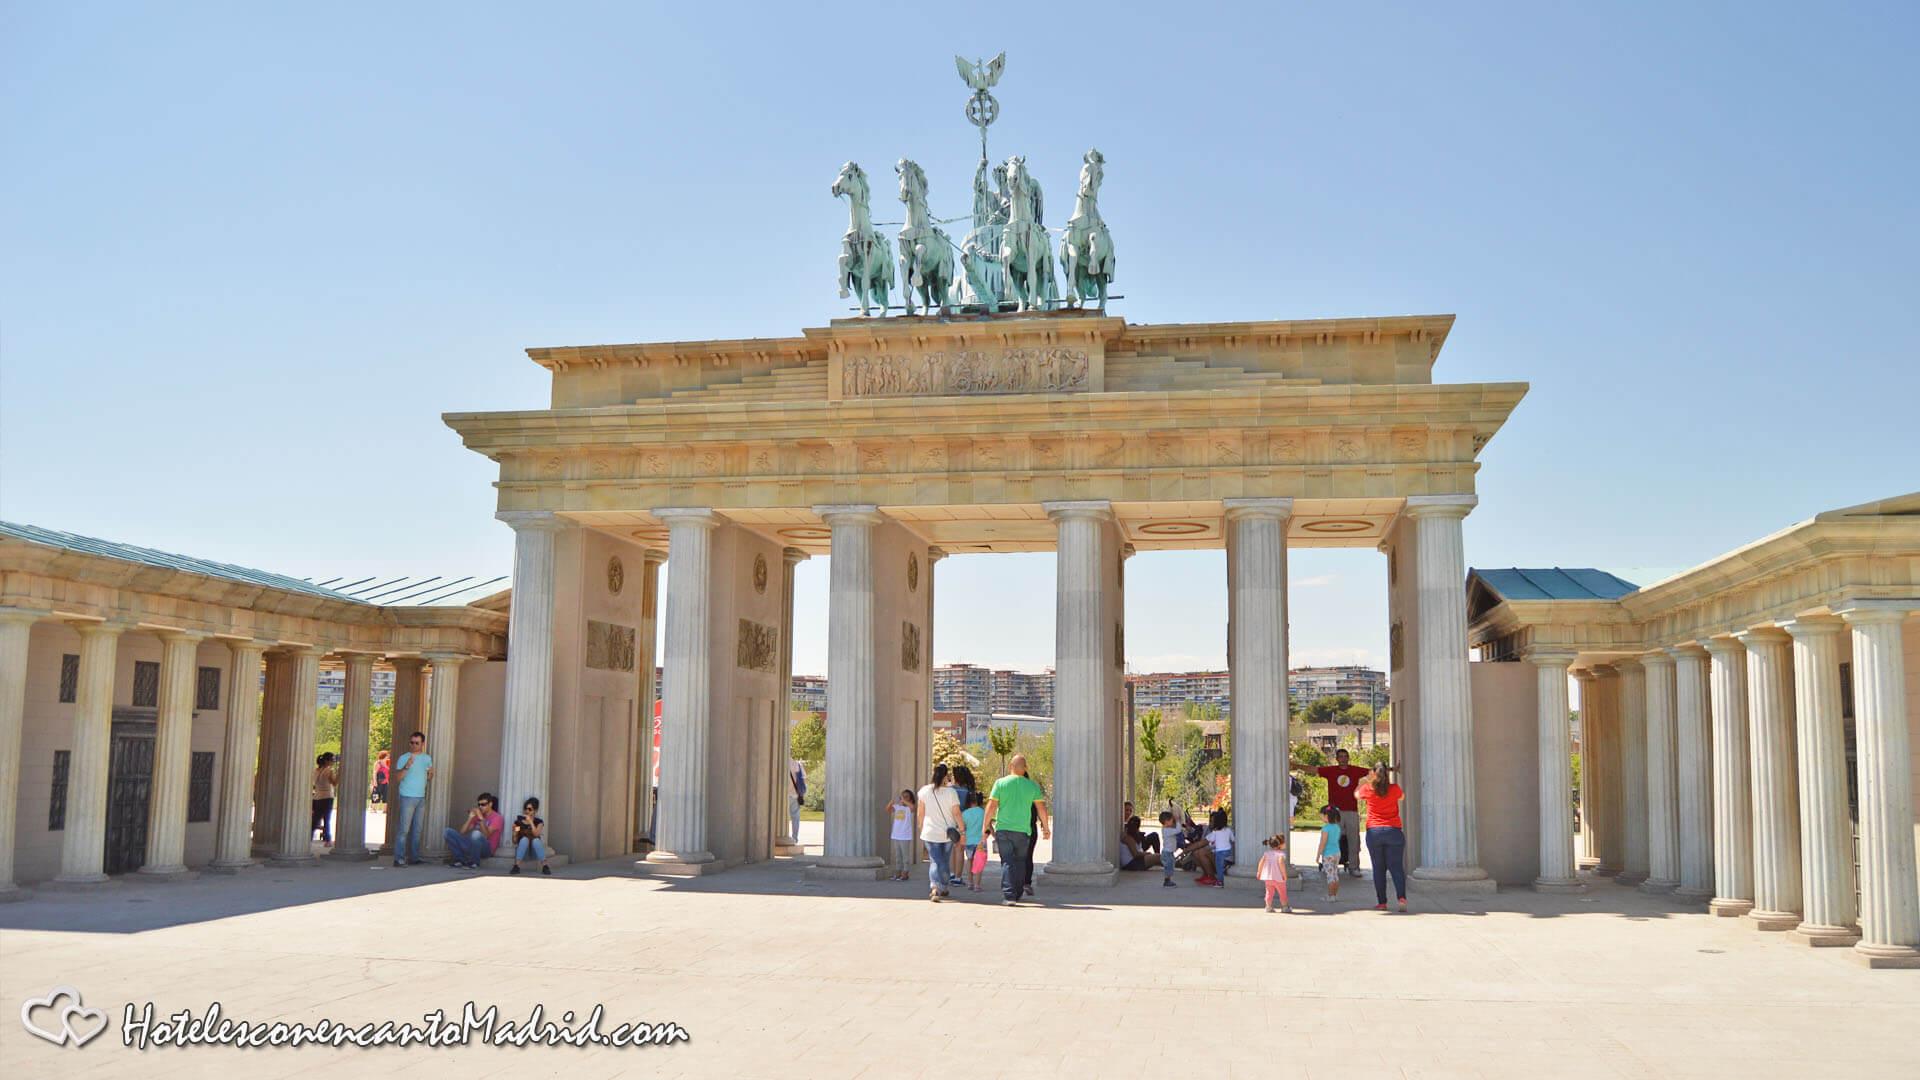 Parque Europa Madrid - Puerta de Brandenburgo